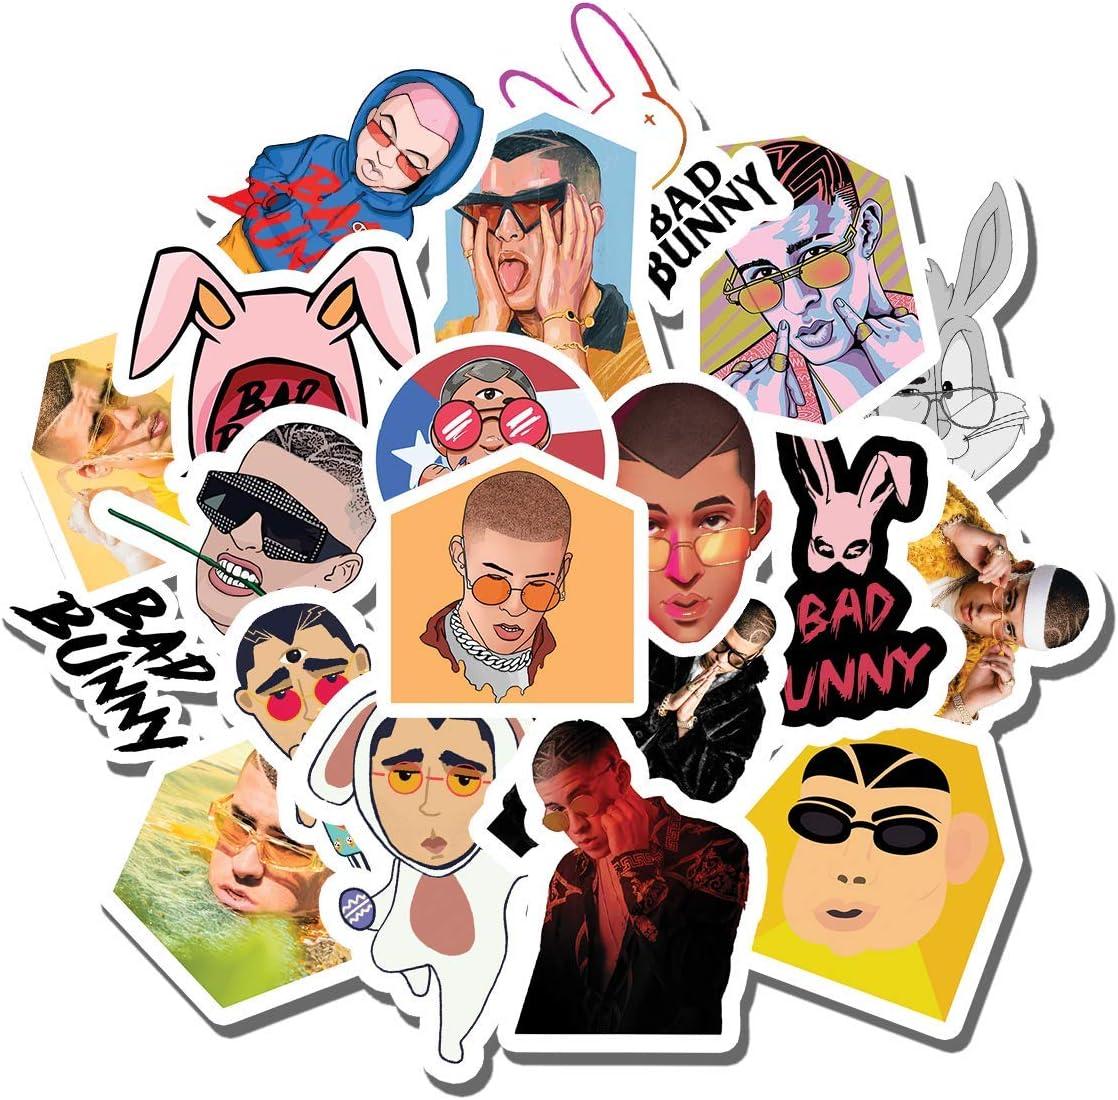 Amazon Com 20 Pcs Stickers Pack Bad Bunny Aesthetic Vinyl